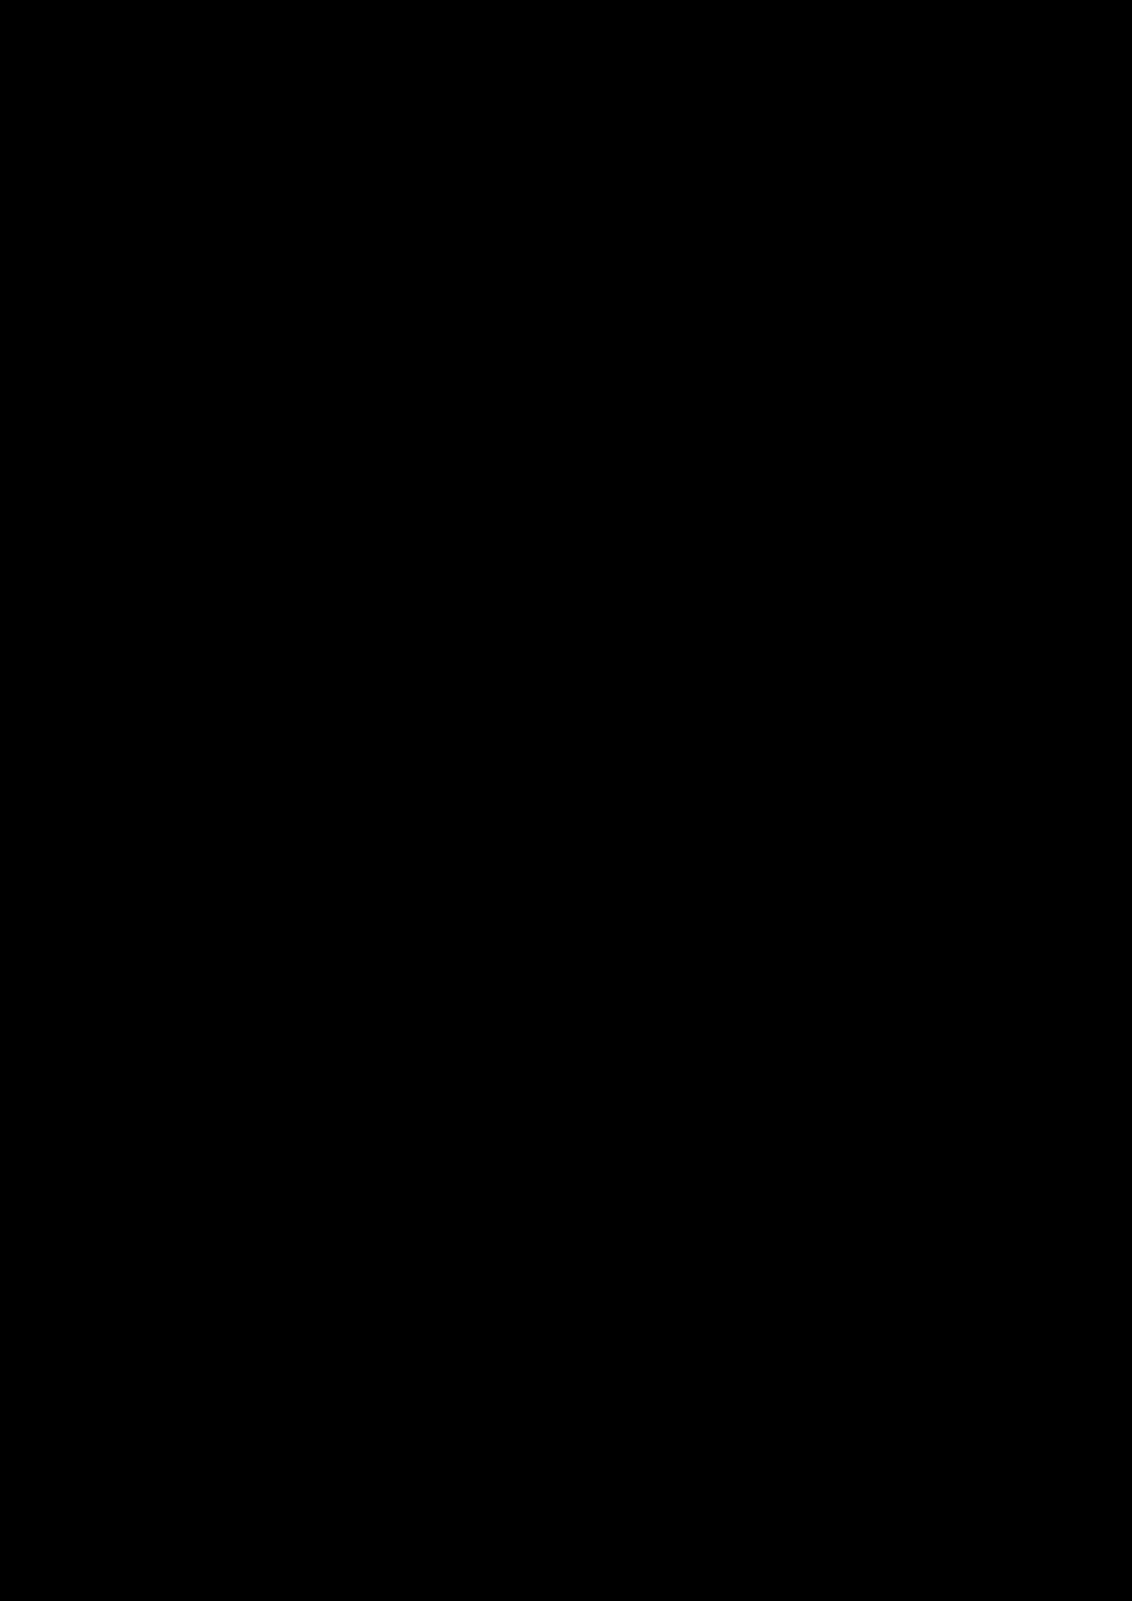 Ten lyubvi slide, Image 17